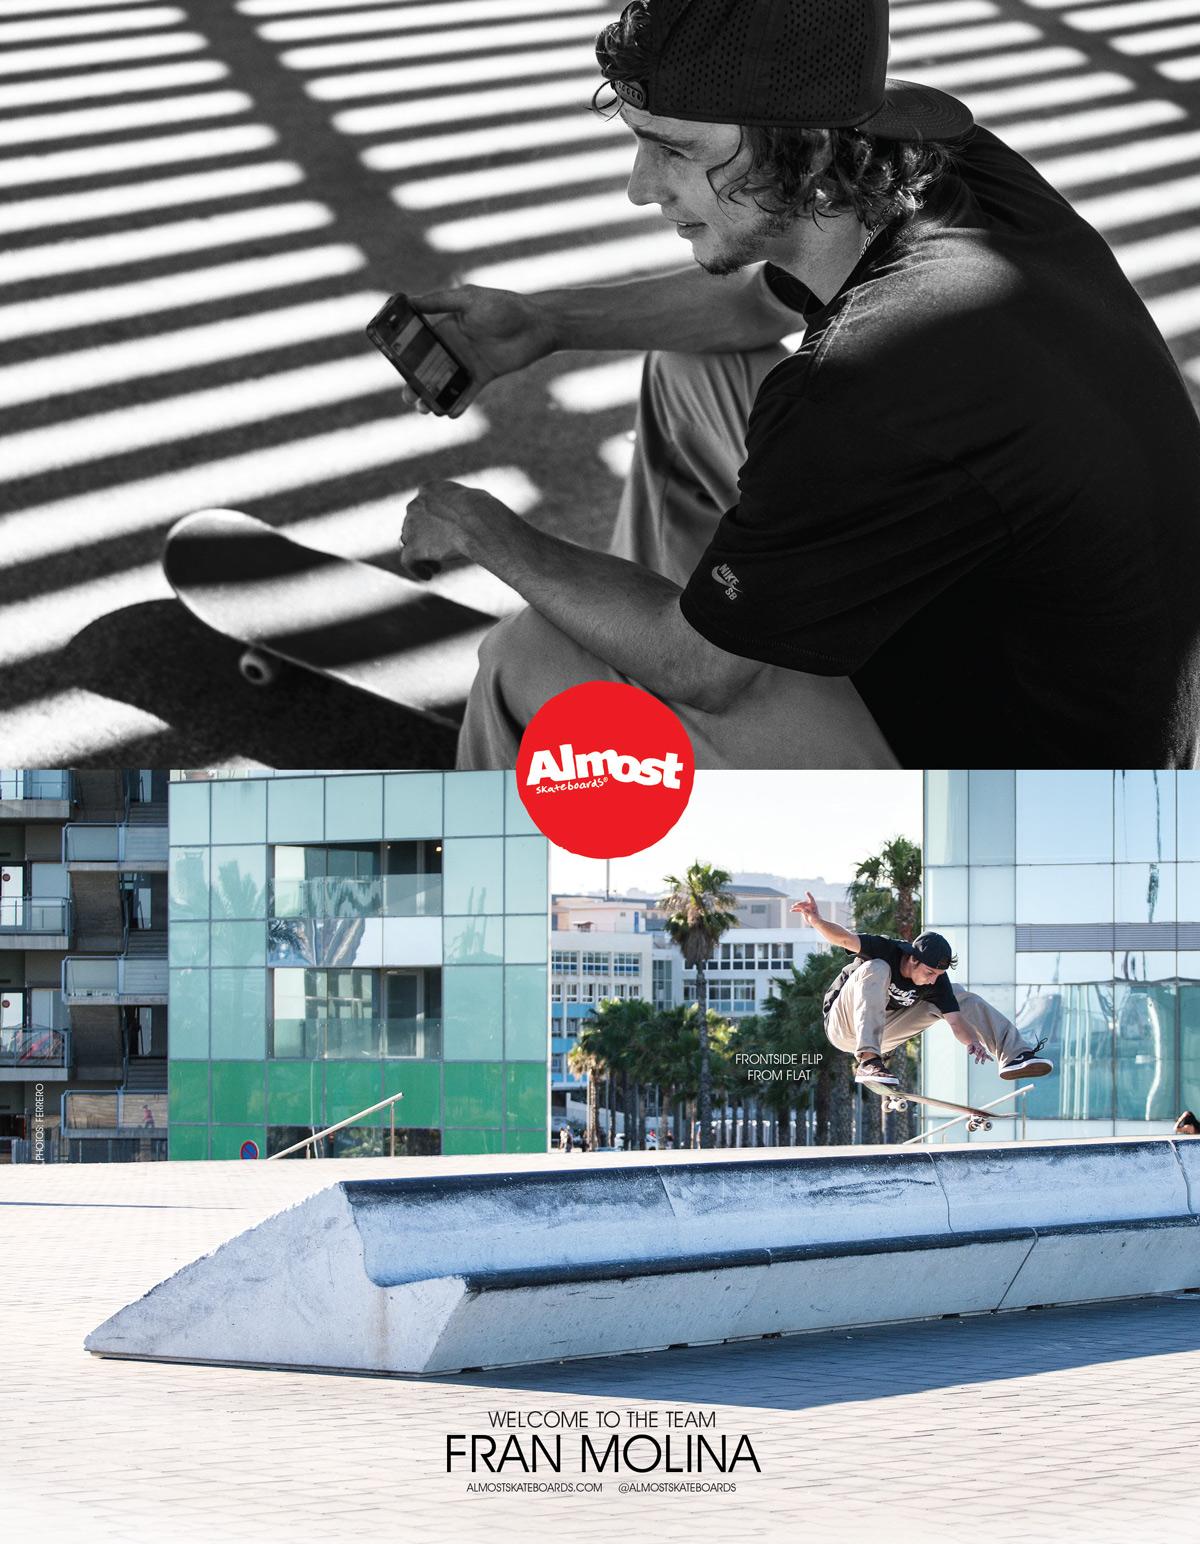 Almost Skateboards Bienvenido Fran Molina welcome ad thrasher magazine